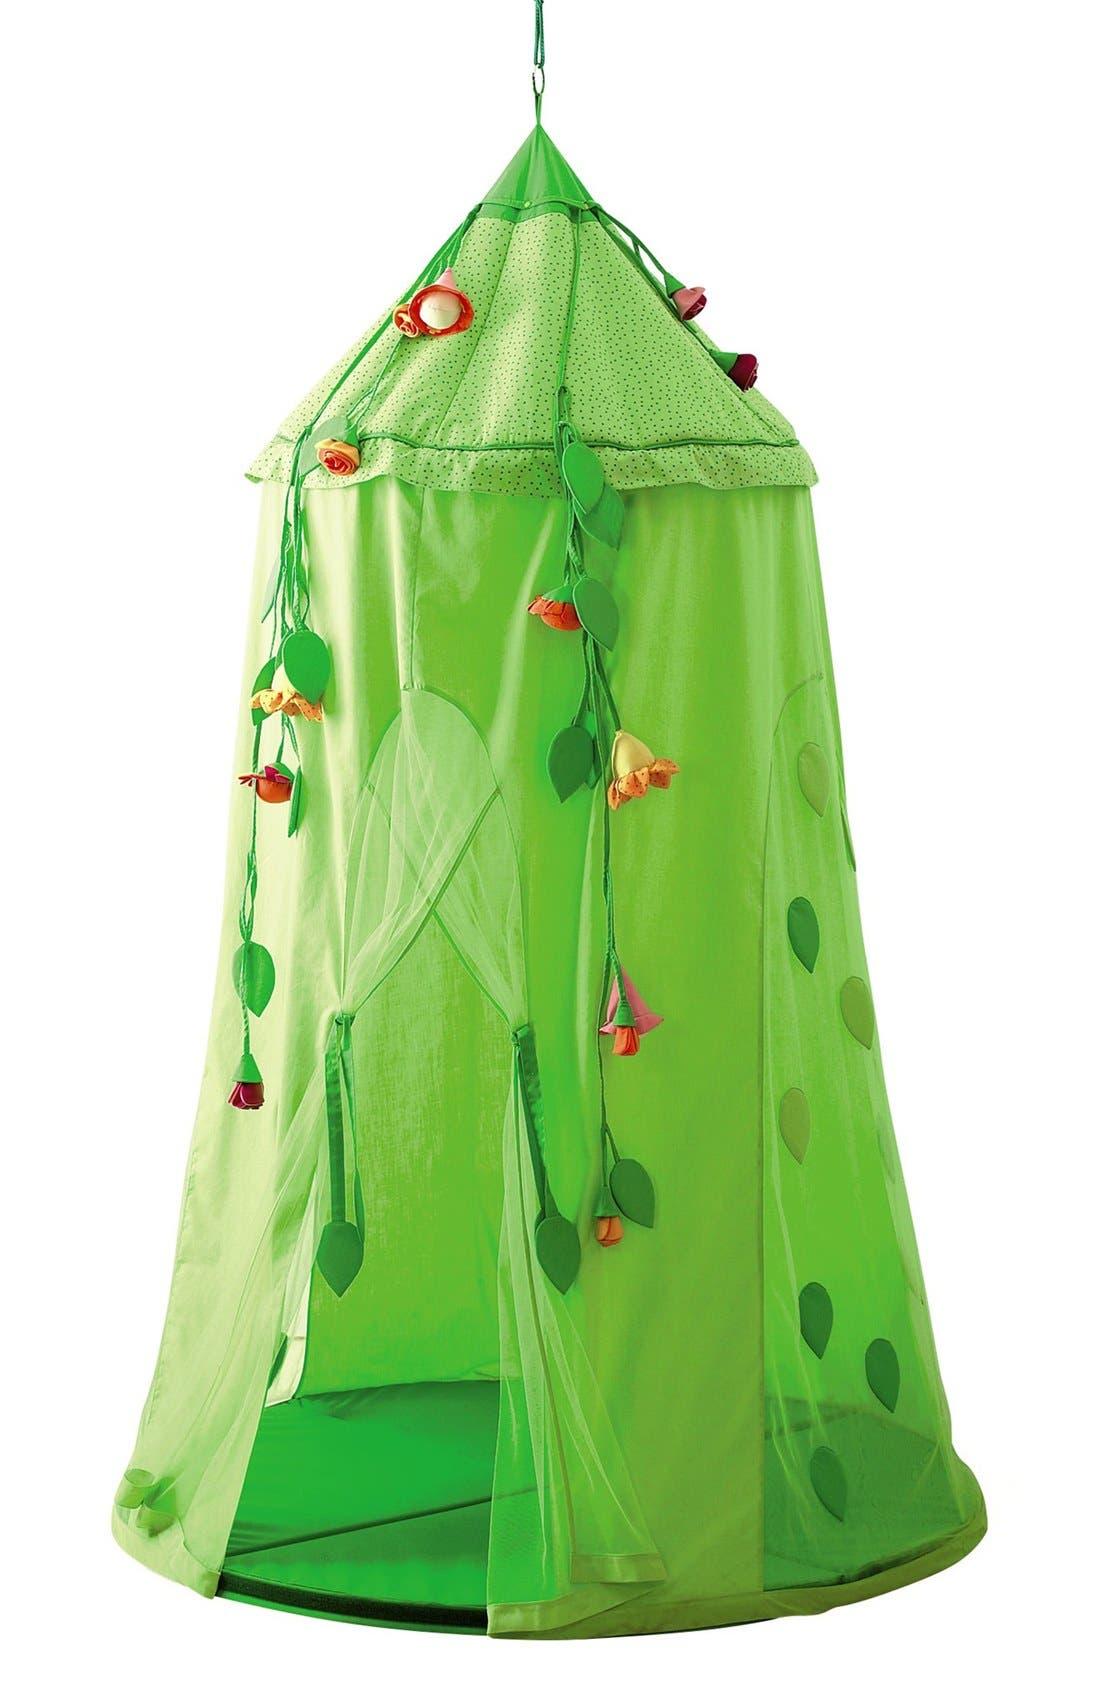 'Blossom Sky' Hanging Play Tent,                             Main thumbnail 1, color,                             300